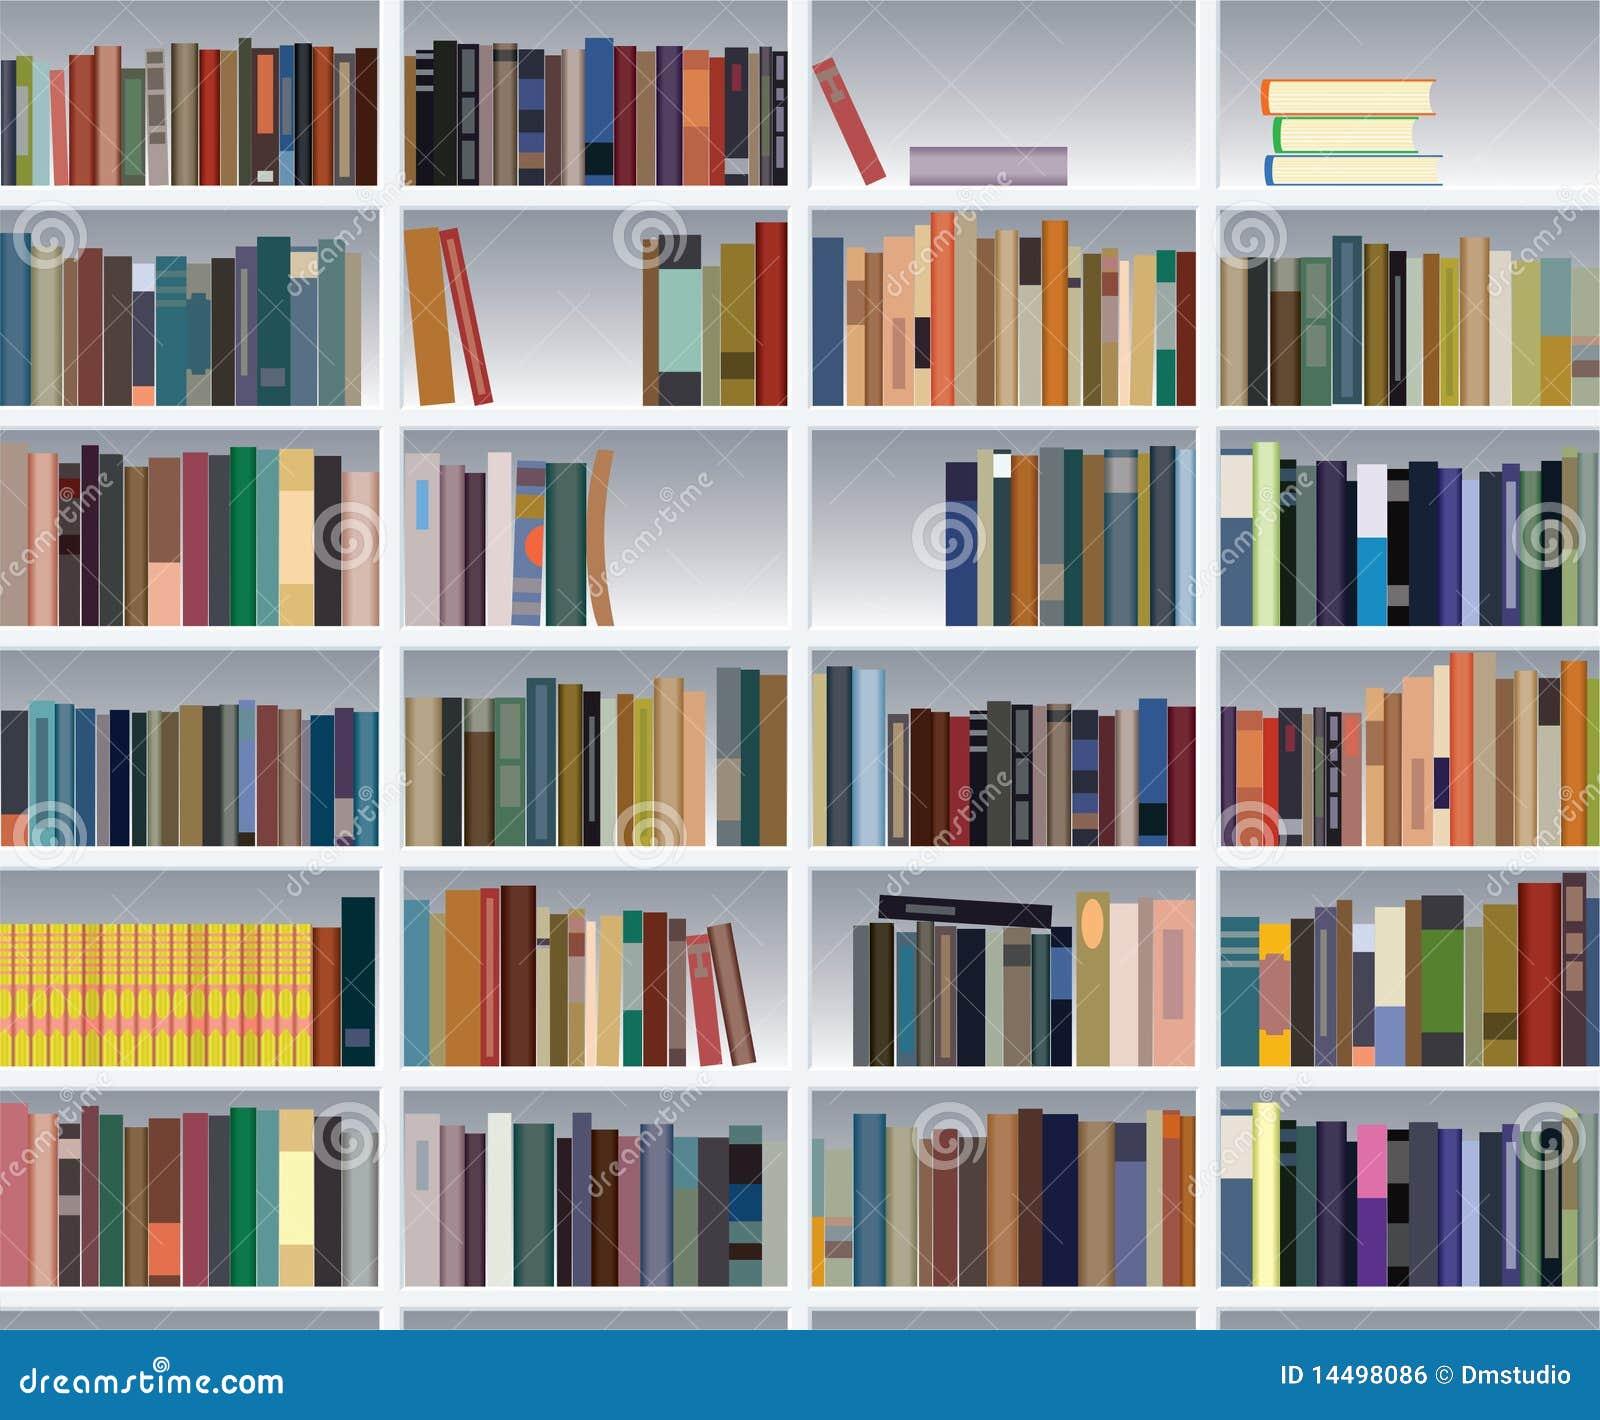 Modernes Bücherregal Lizenzfreies Stockbild  Bild 14498086 ~ Bücherregal Alt